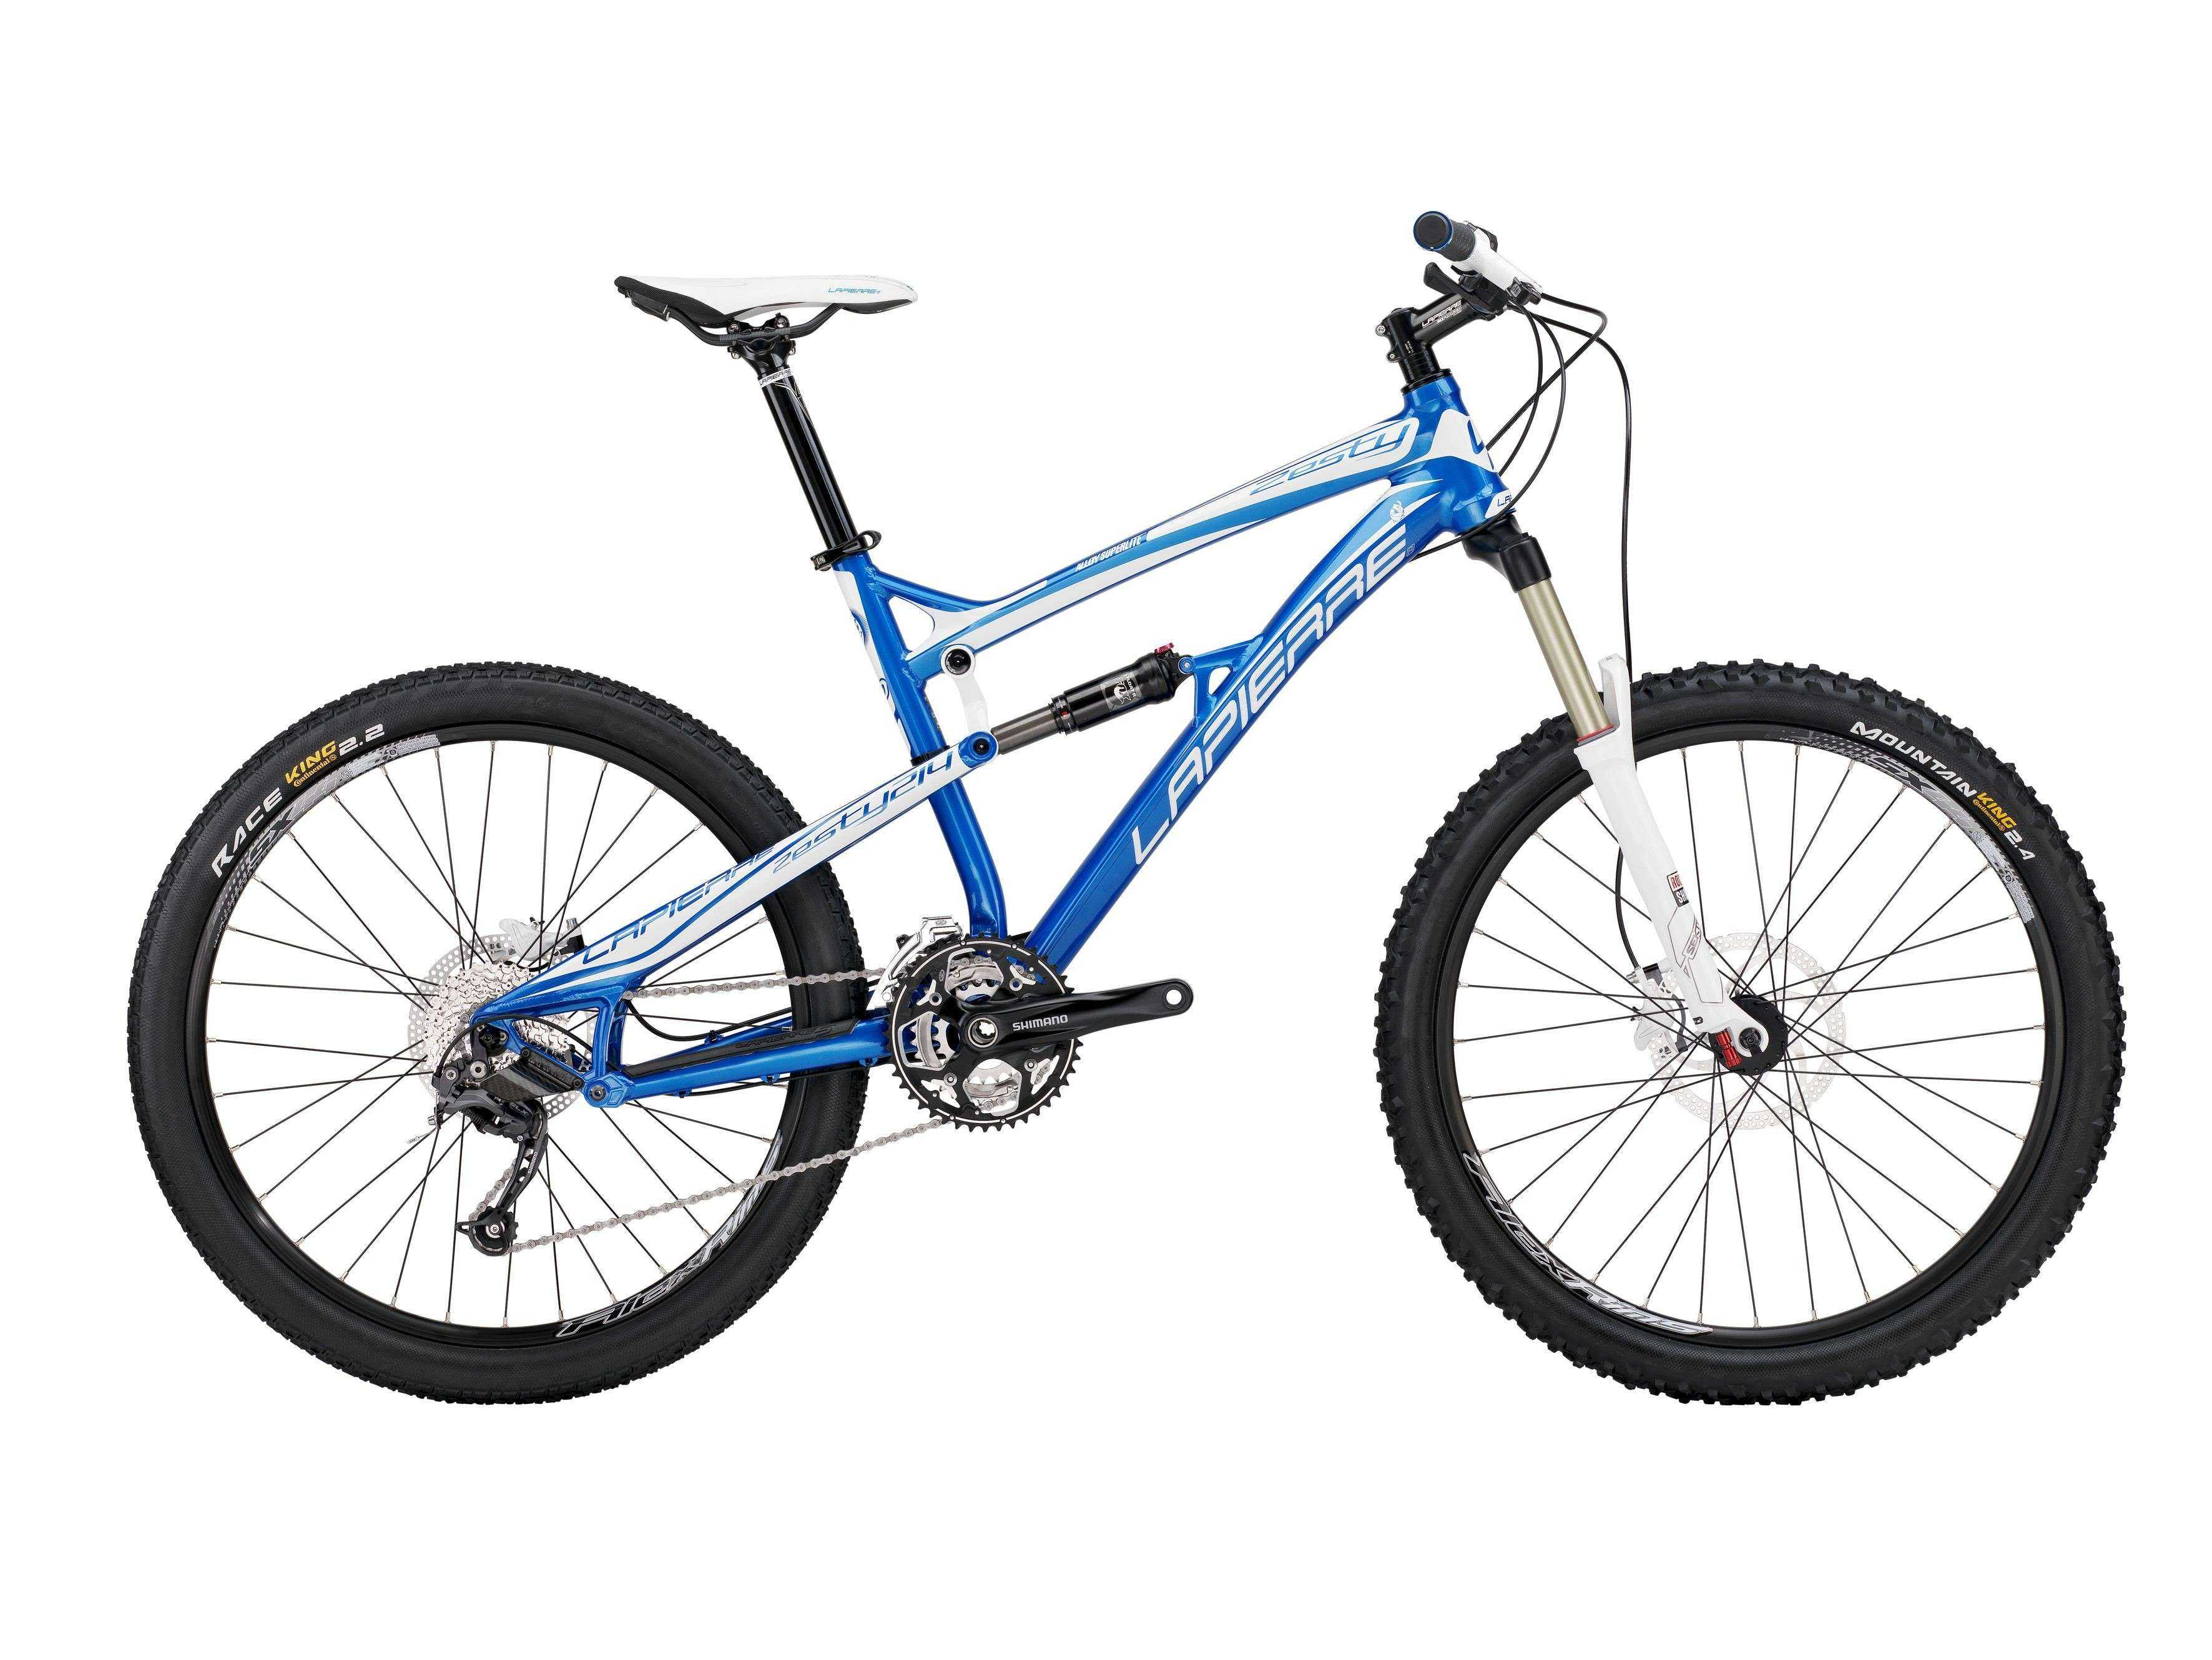 Bicicleta doble suspensi n barata en m laga - La bici azul ...